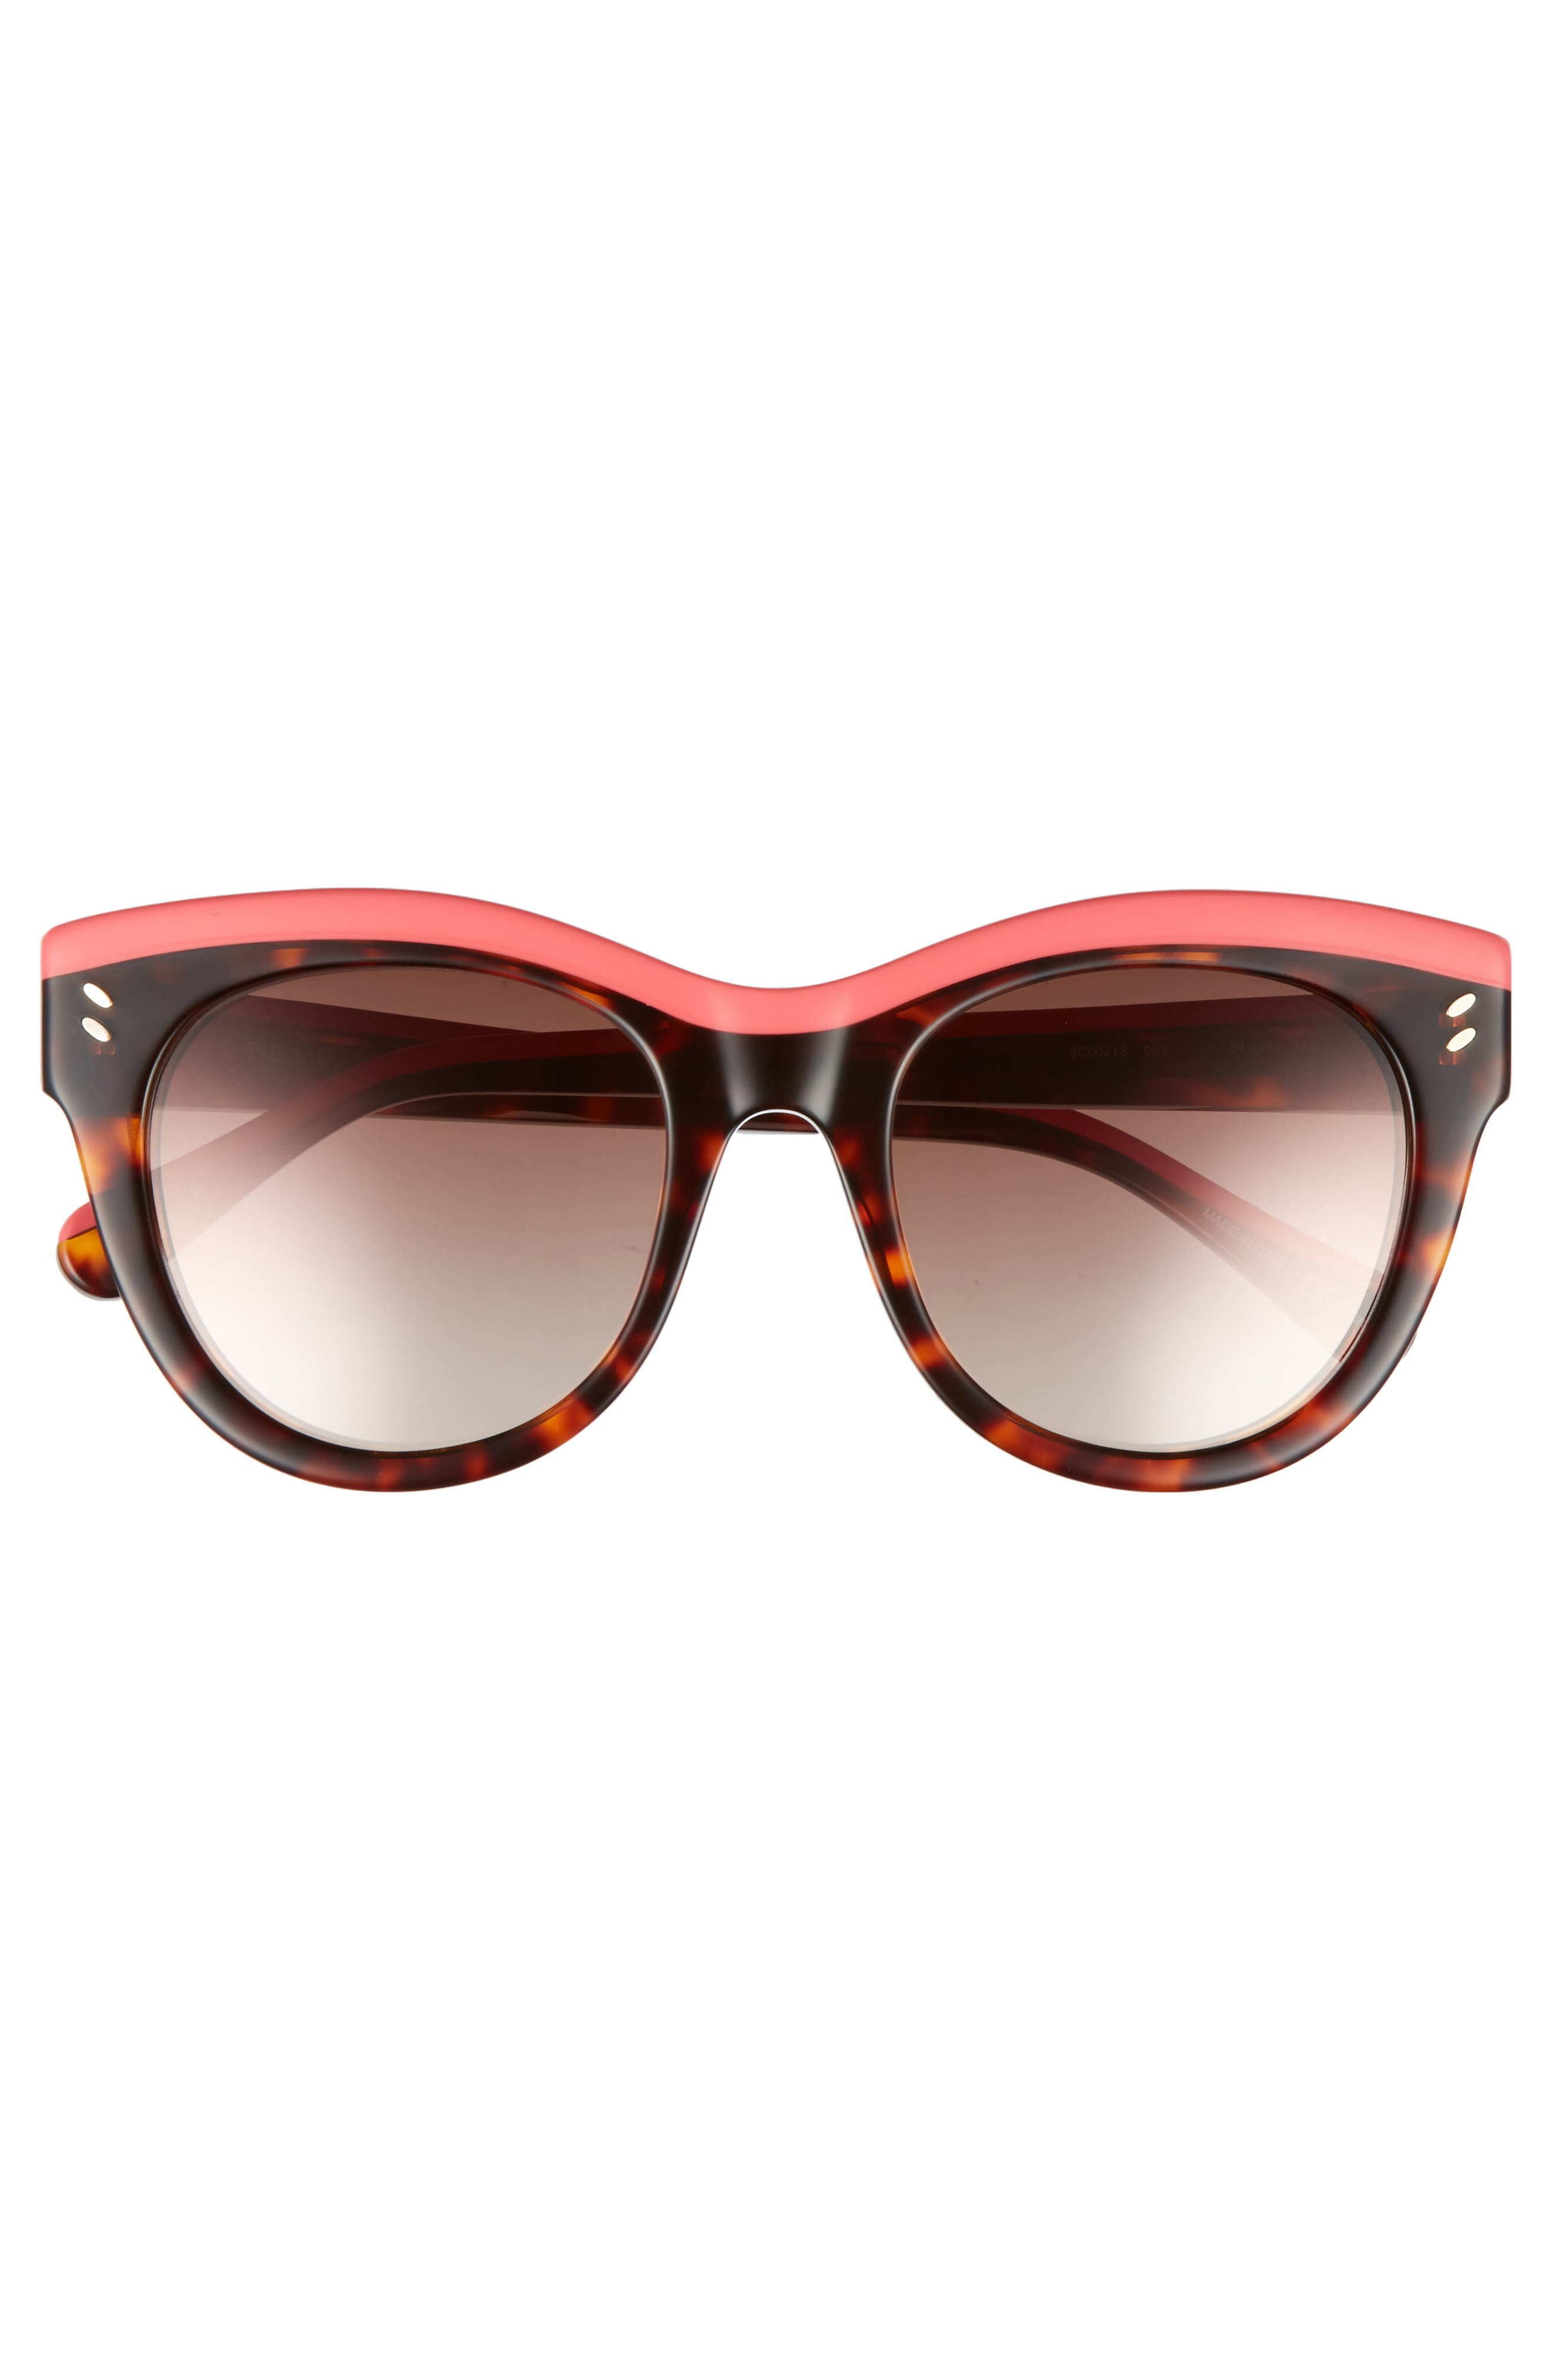 51mm Cat Eye Sunglasses,                             Alternate thumbnail 3, color,                             Pink/ Avana